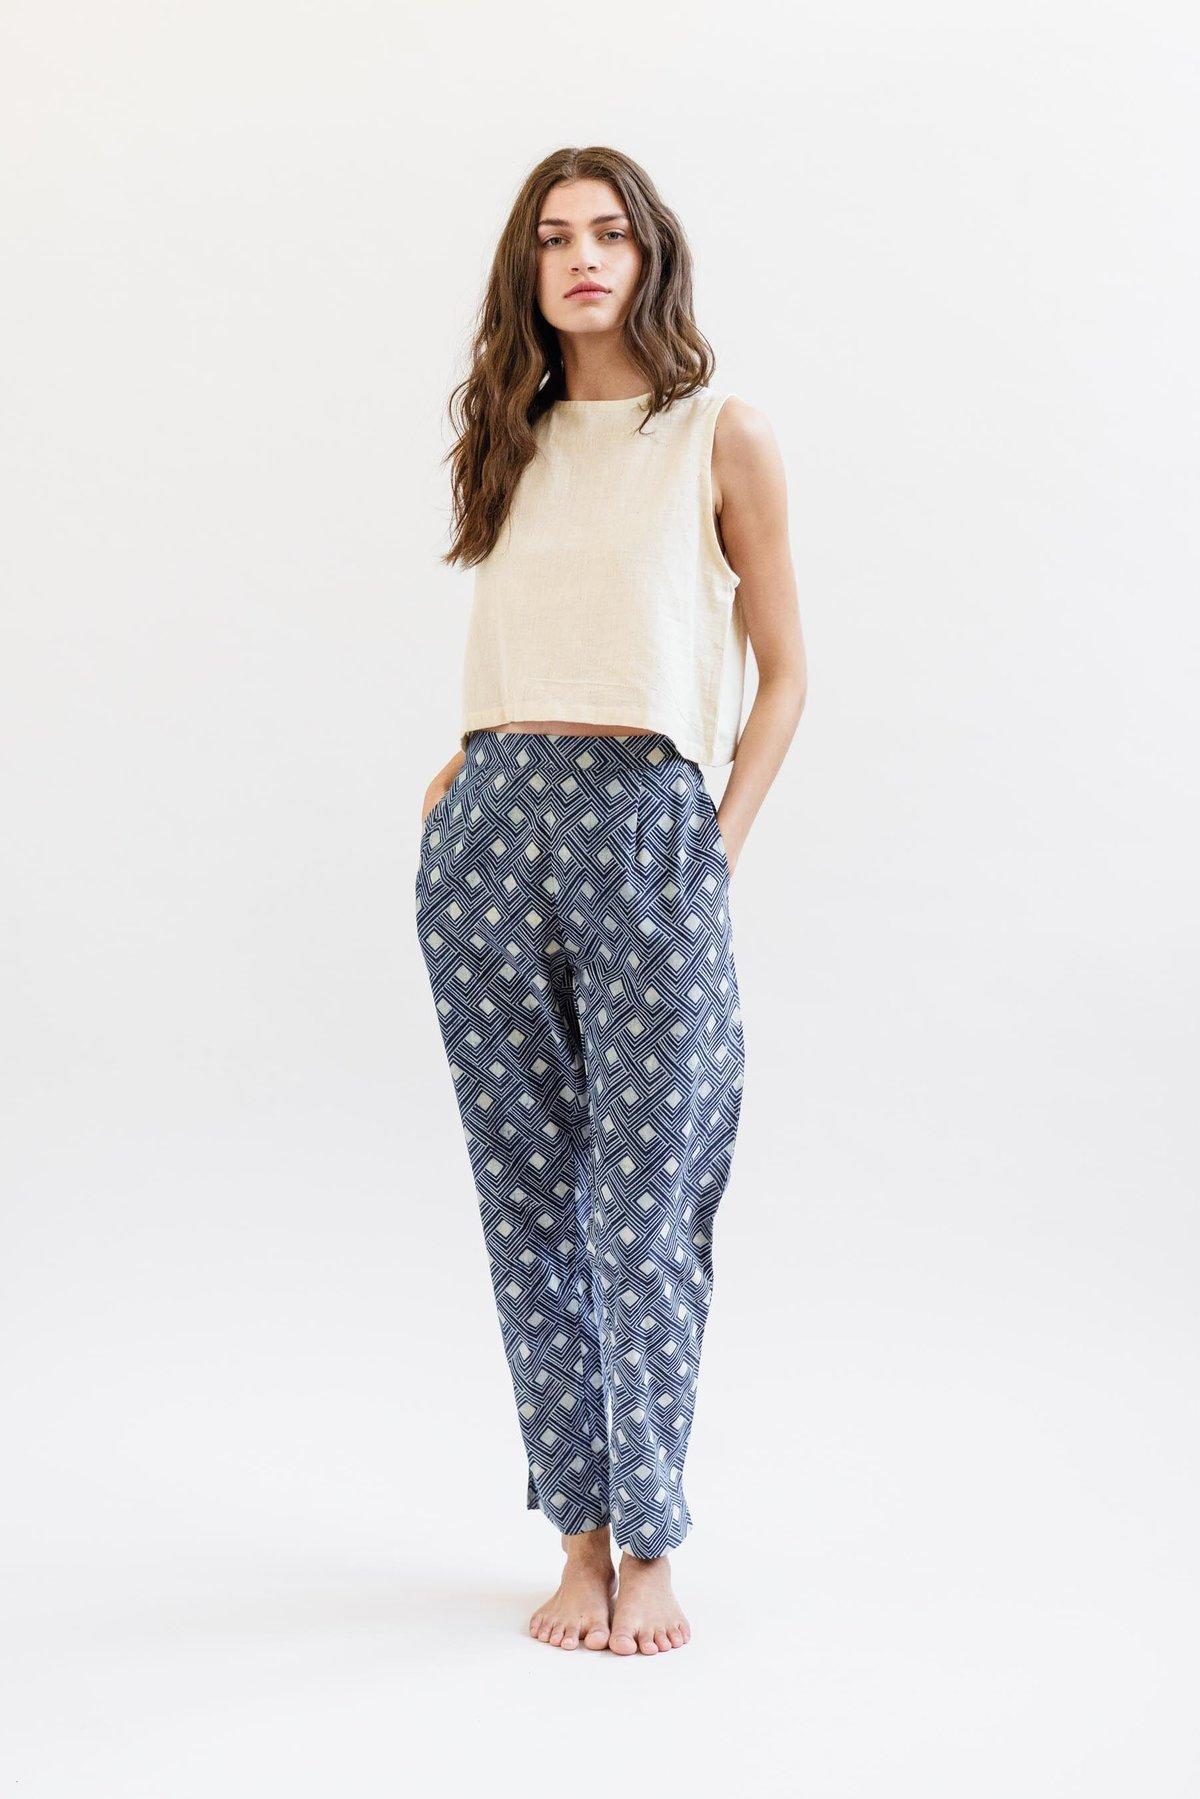 Image of Maelu Lounge Pants - Alys Print